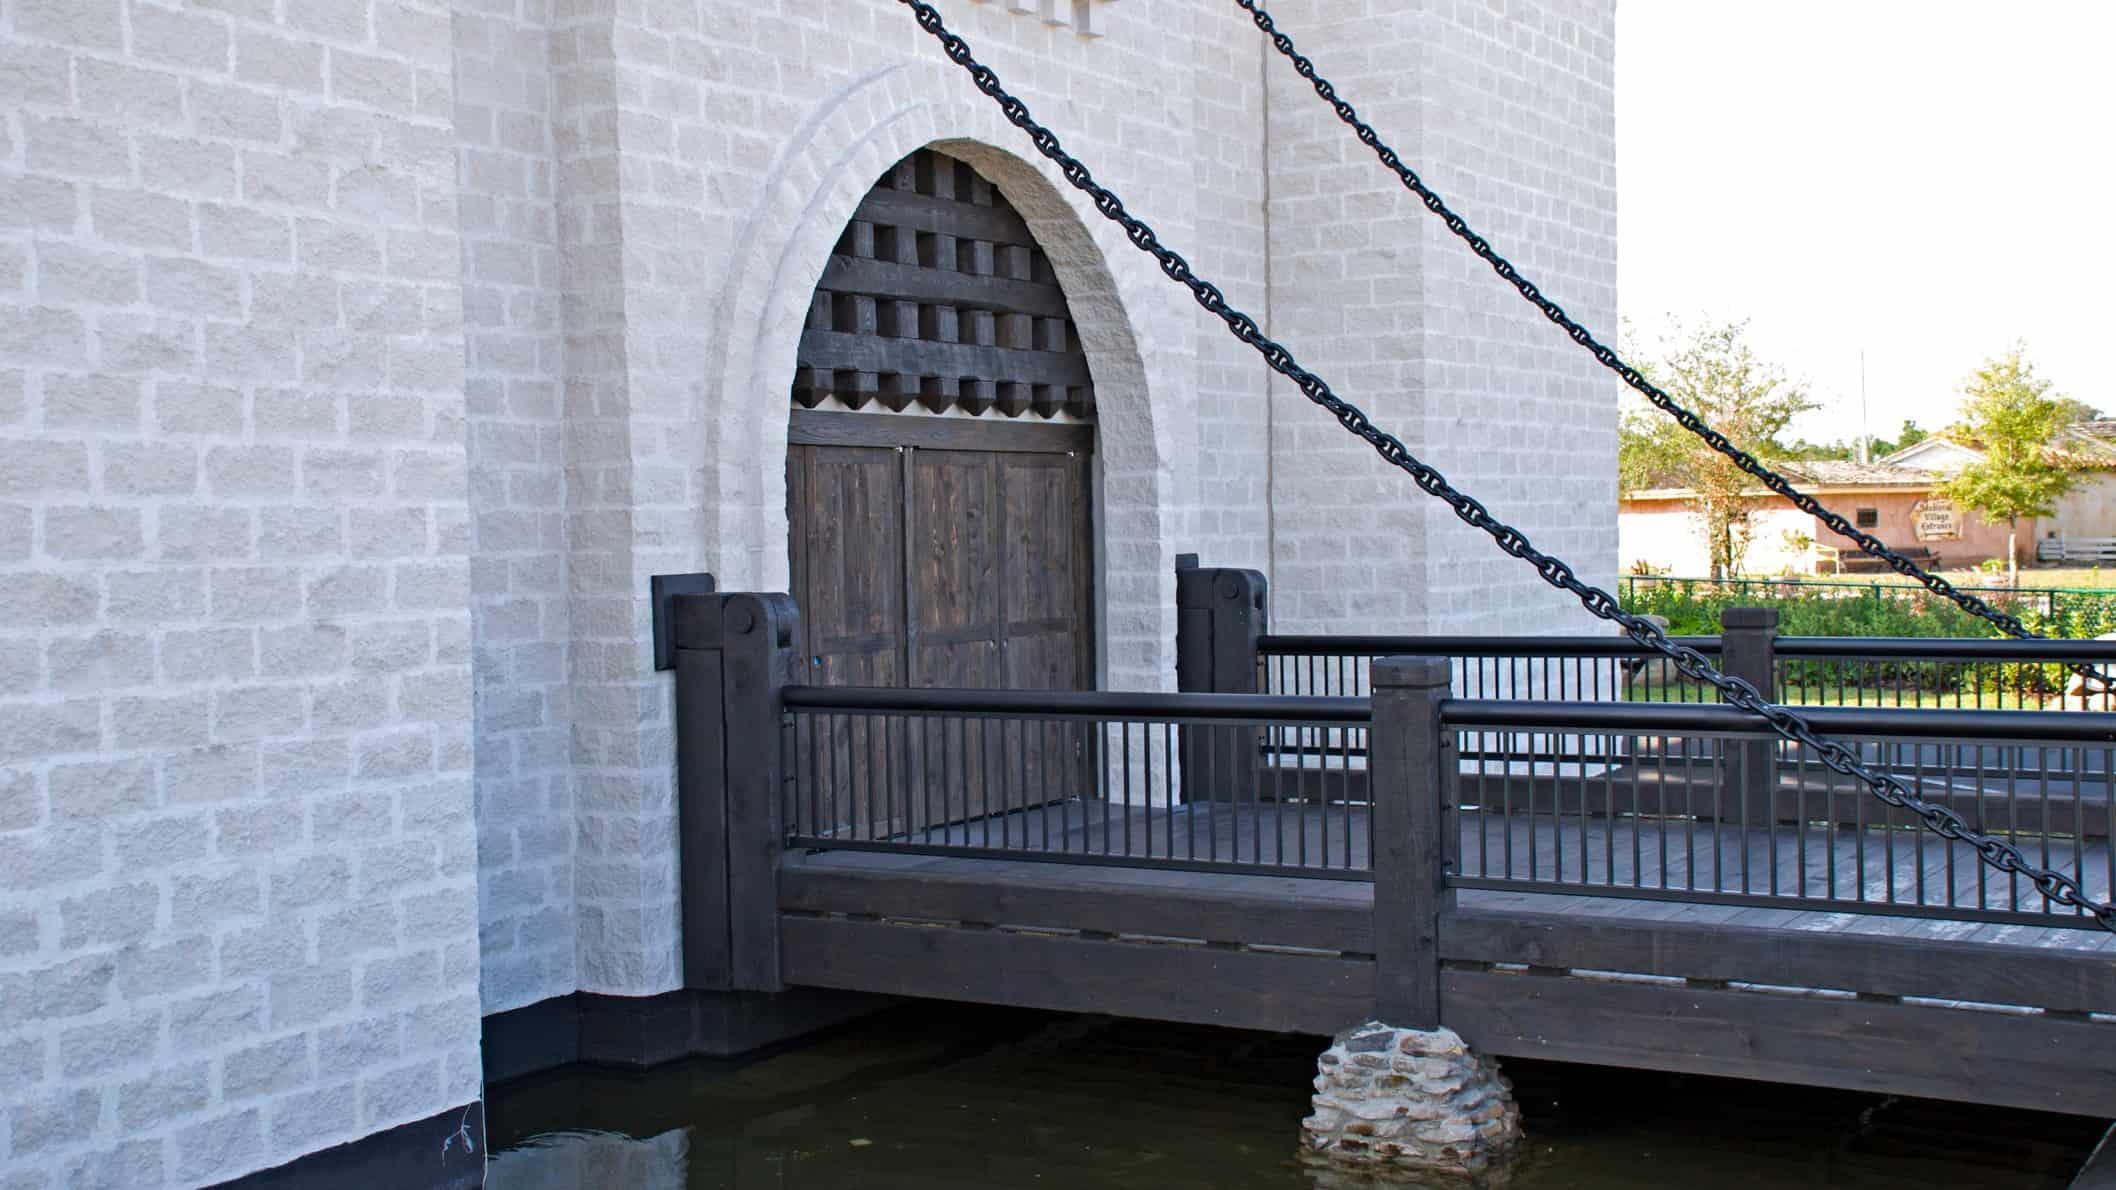 Castle drawbridge over moat